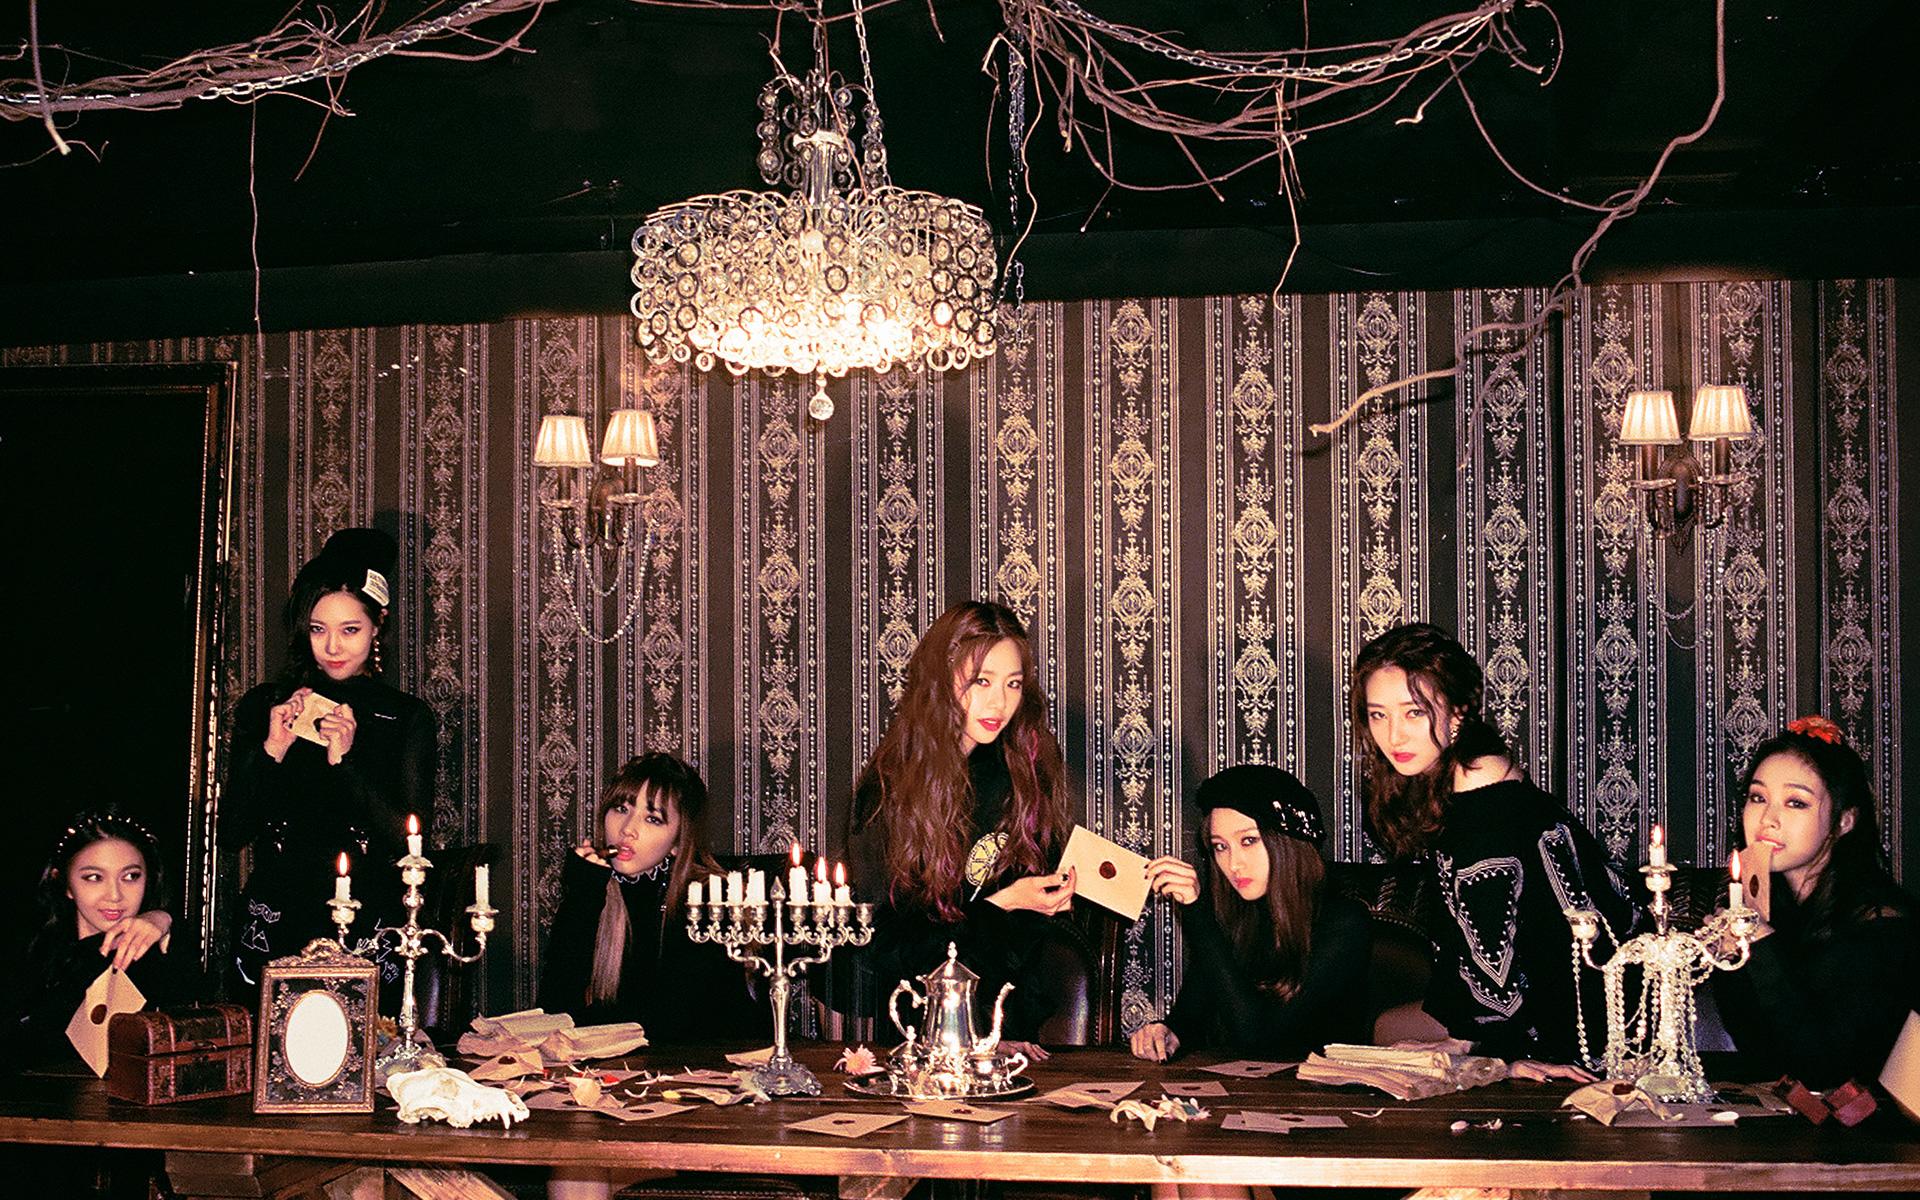 dreamcatcher-black-group